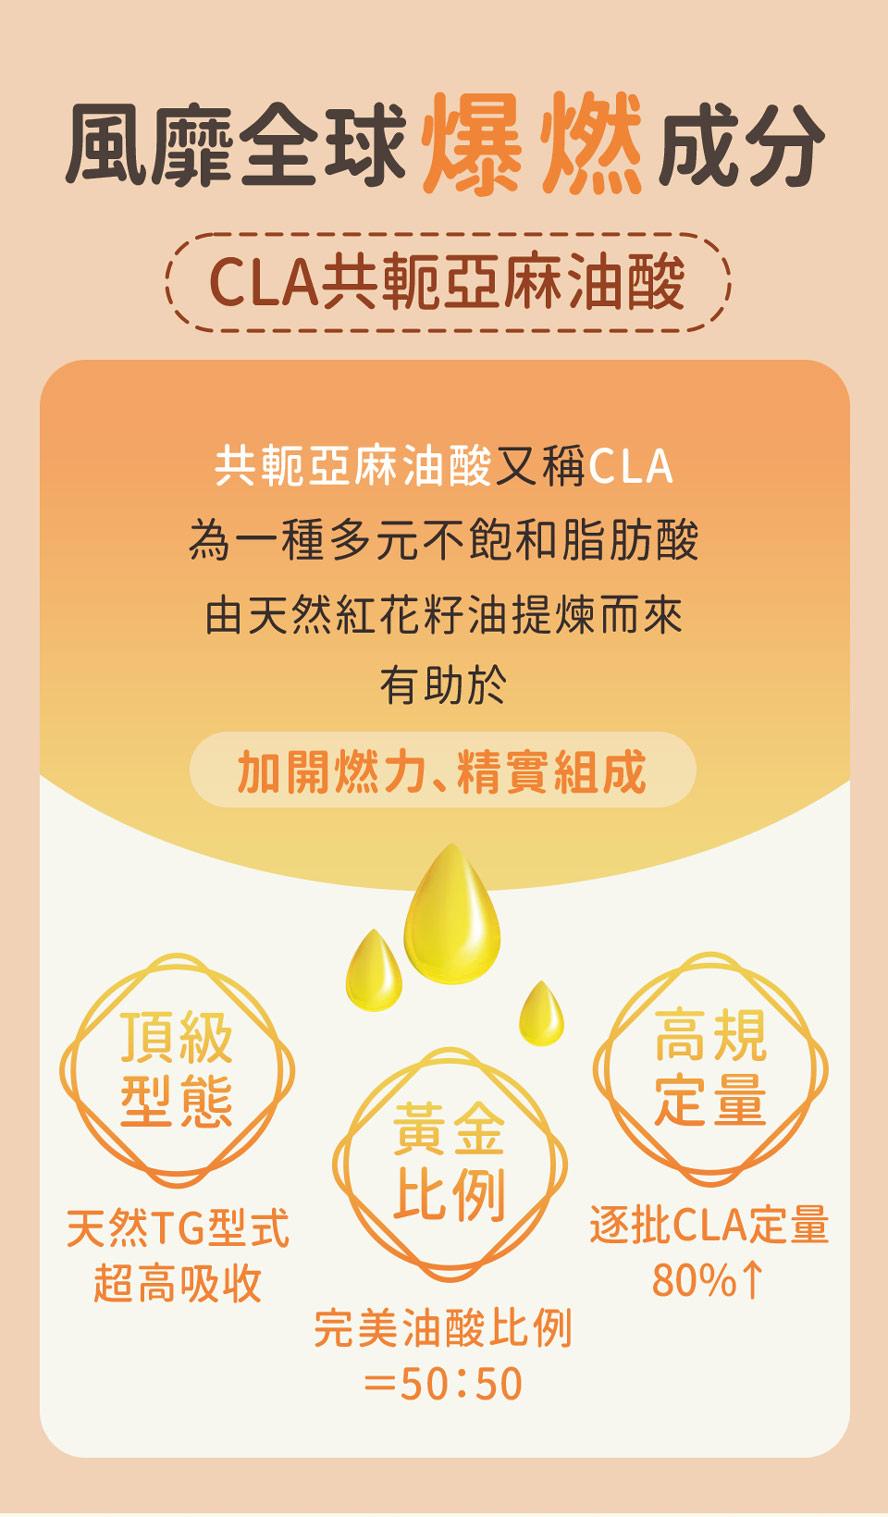 BHK's紅花籽油採天然TG型式好吸收,油酸比例50:50,幫助窈窕更有感